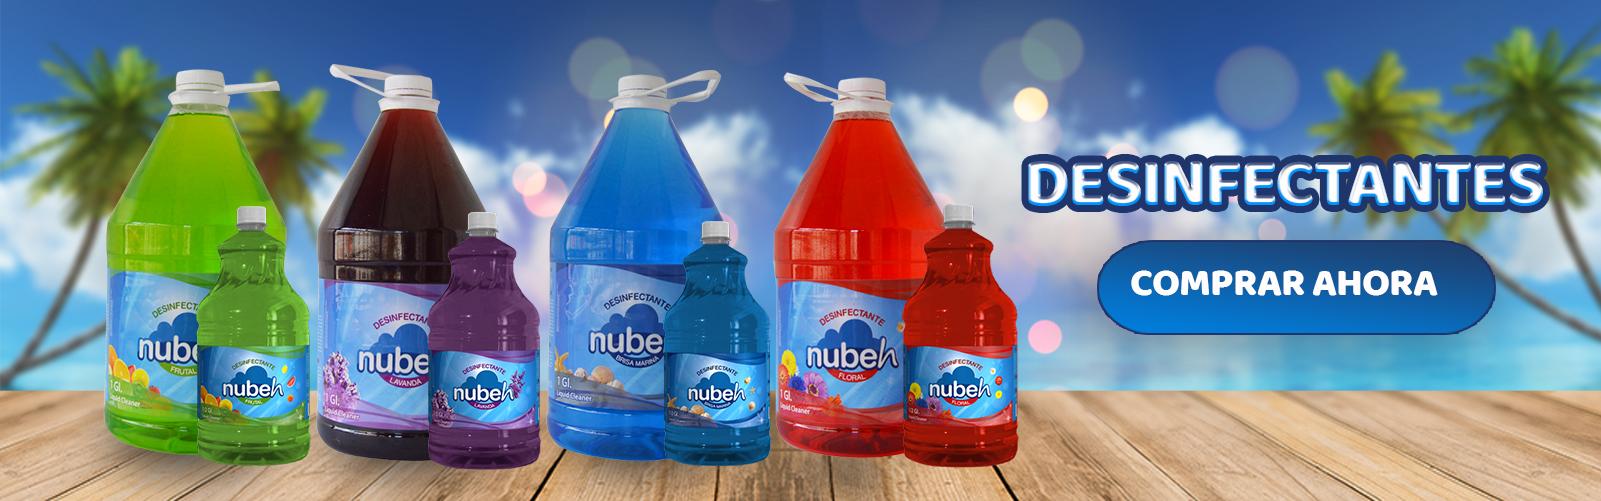 Desinfectante de pisos  -  Nubeh